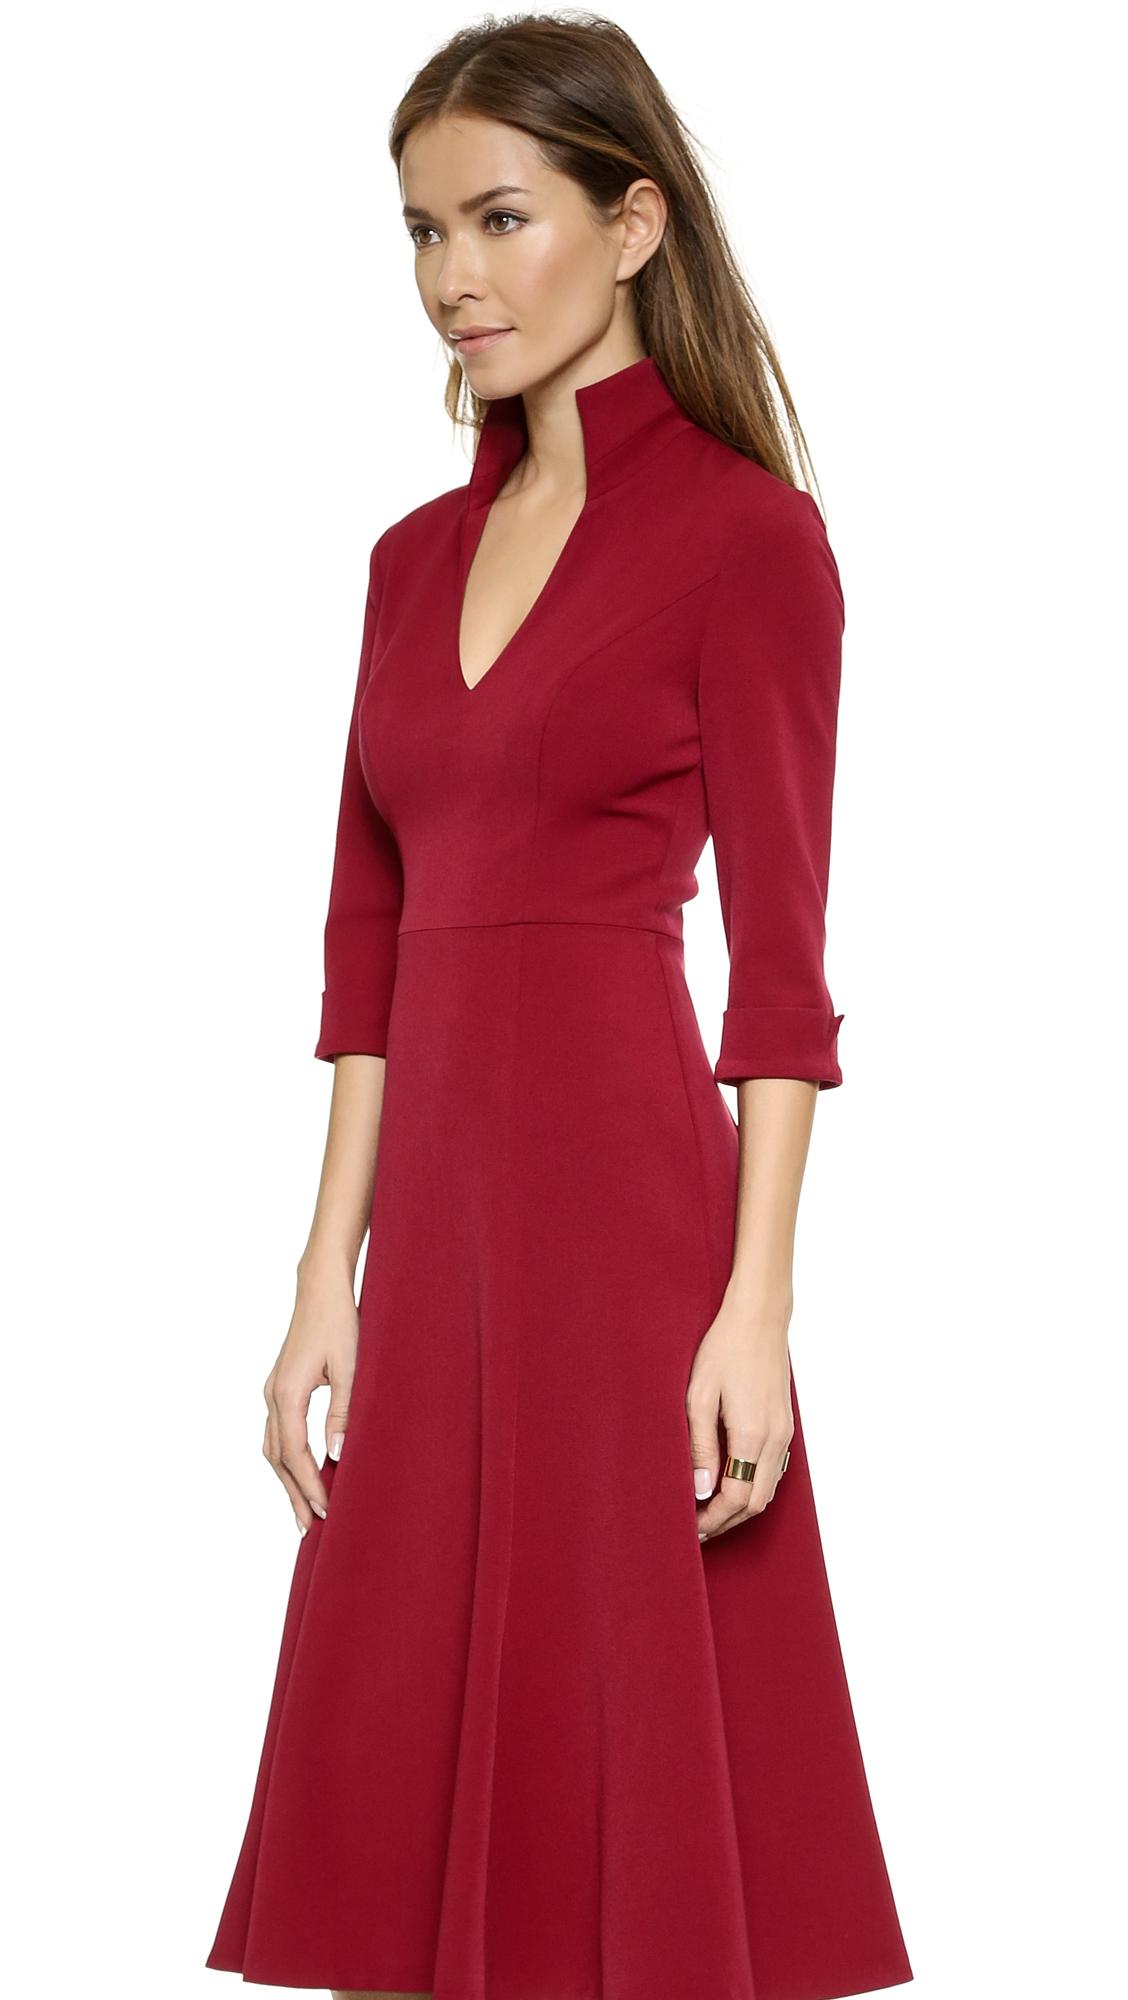 b66d36518a2fe Black Halo Kensington Dress - Red in Red - Lyst